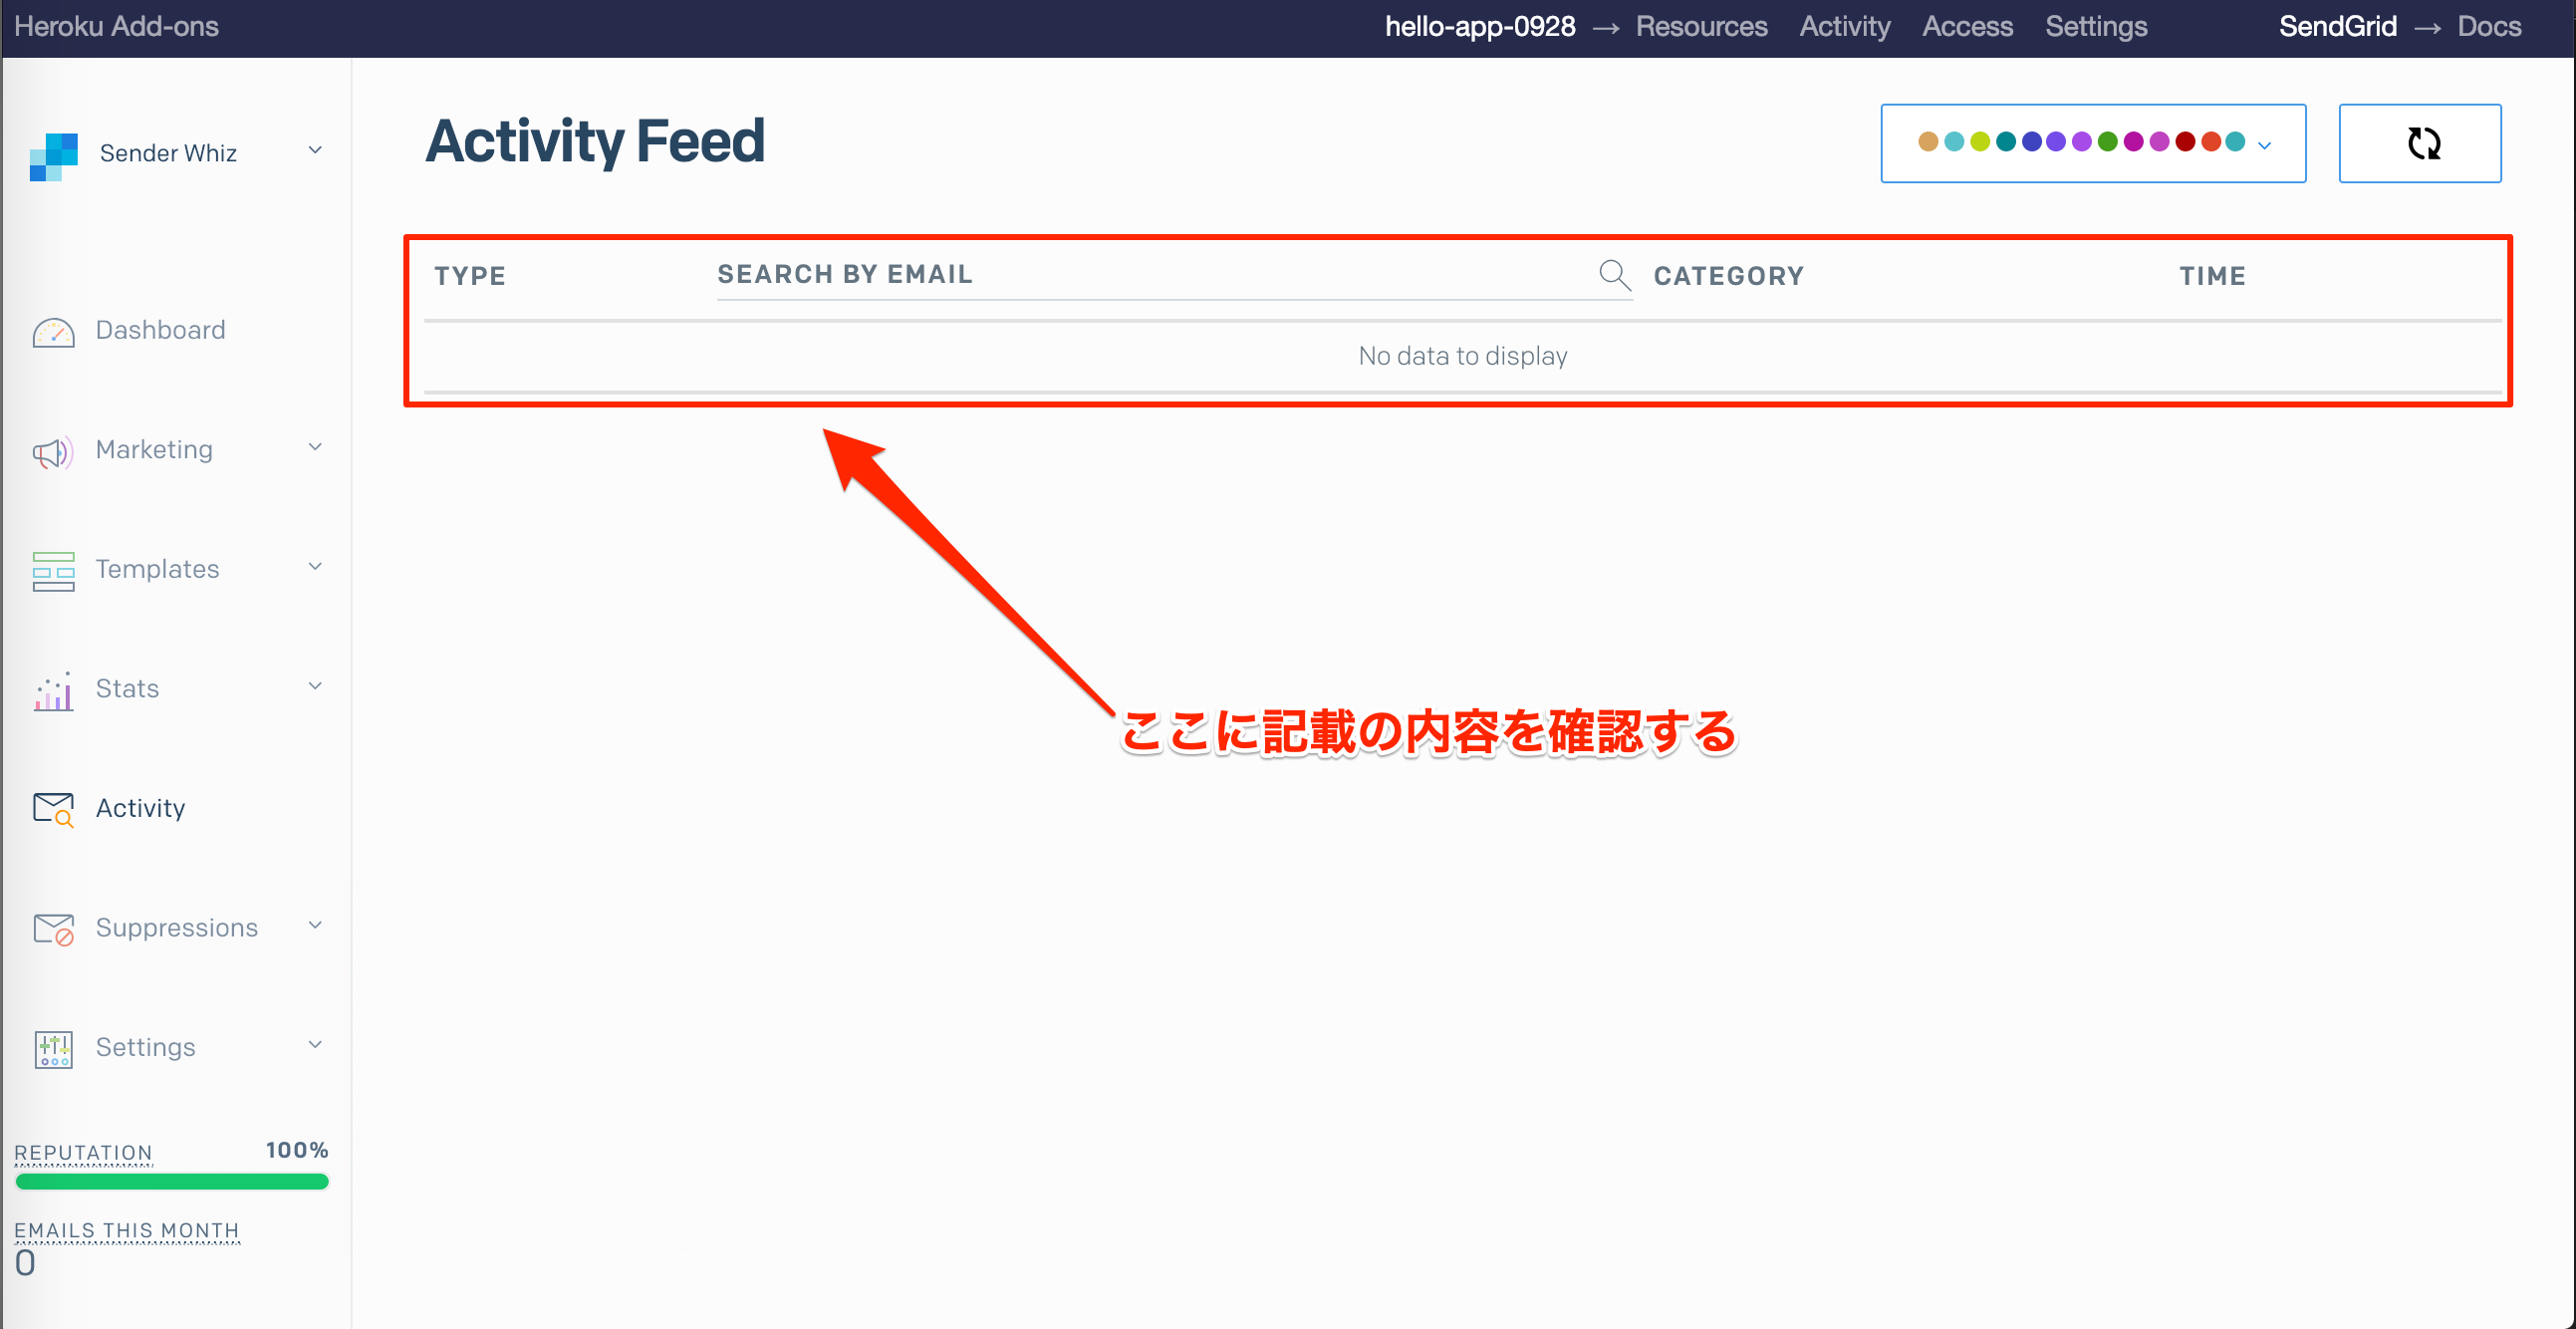 sendgrid-activity-log.png